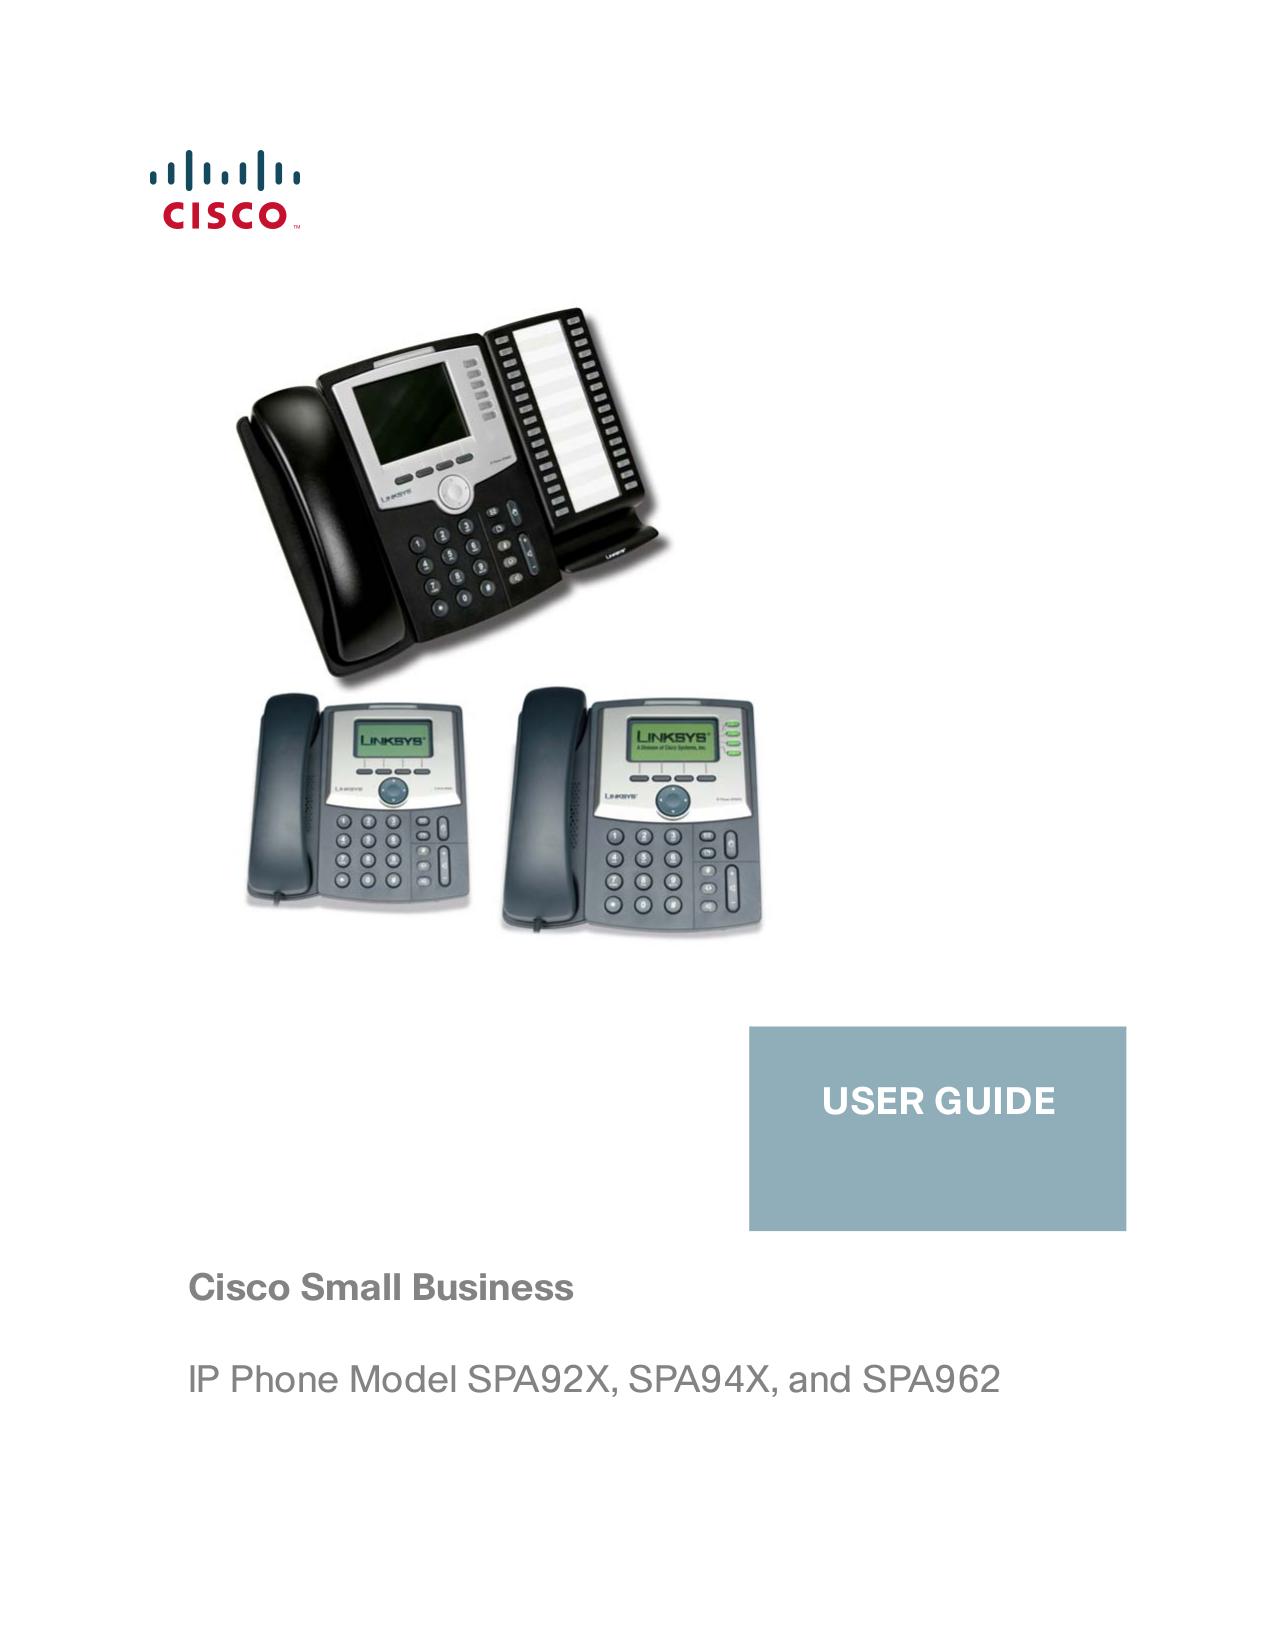 Cisco Spa504g Инструкция На Русском